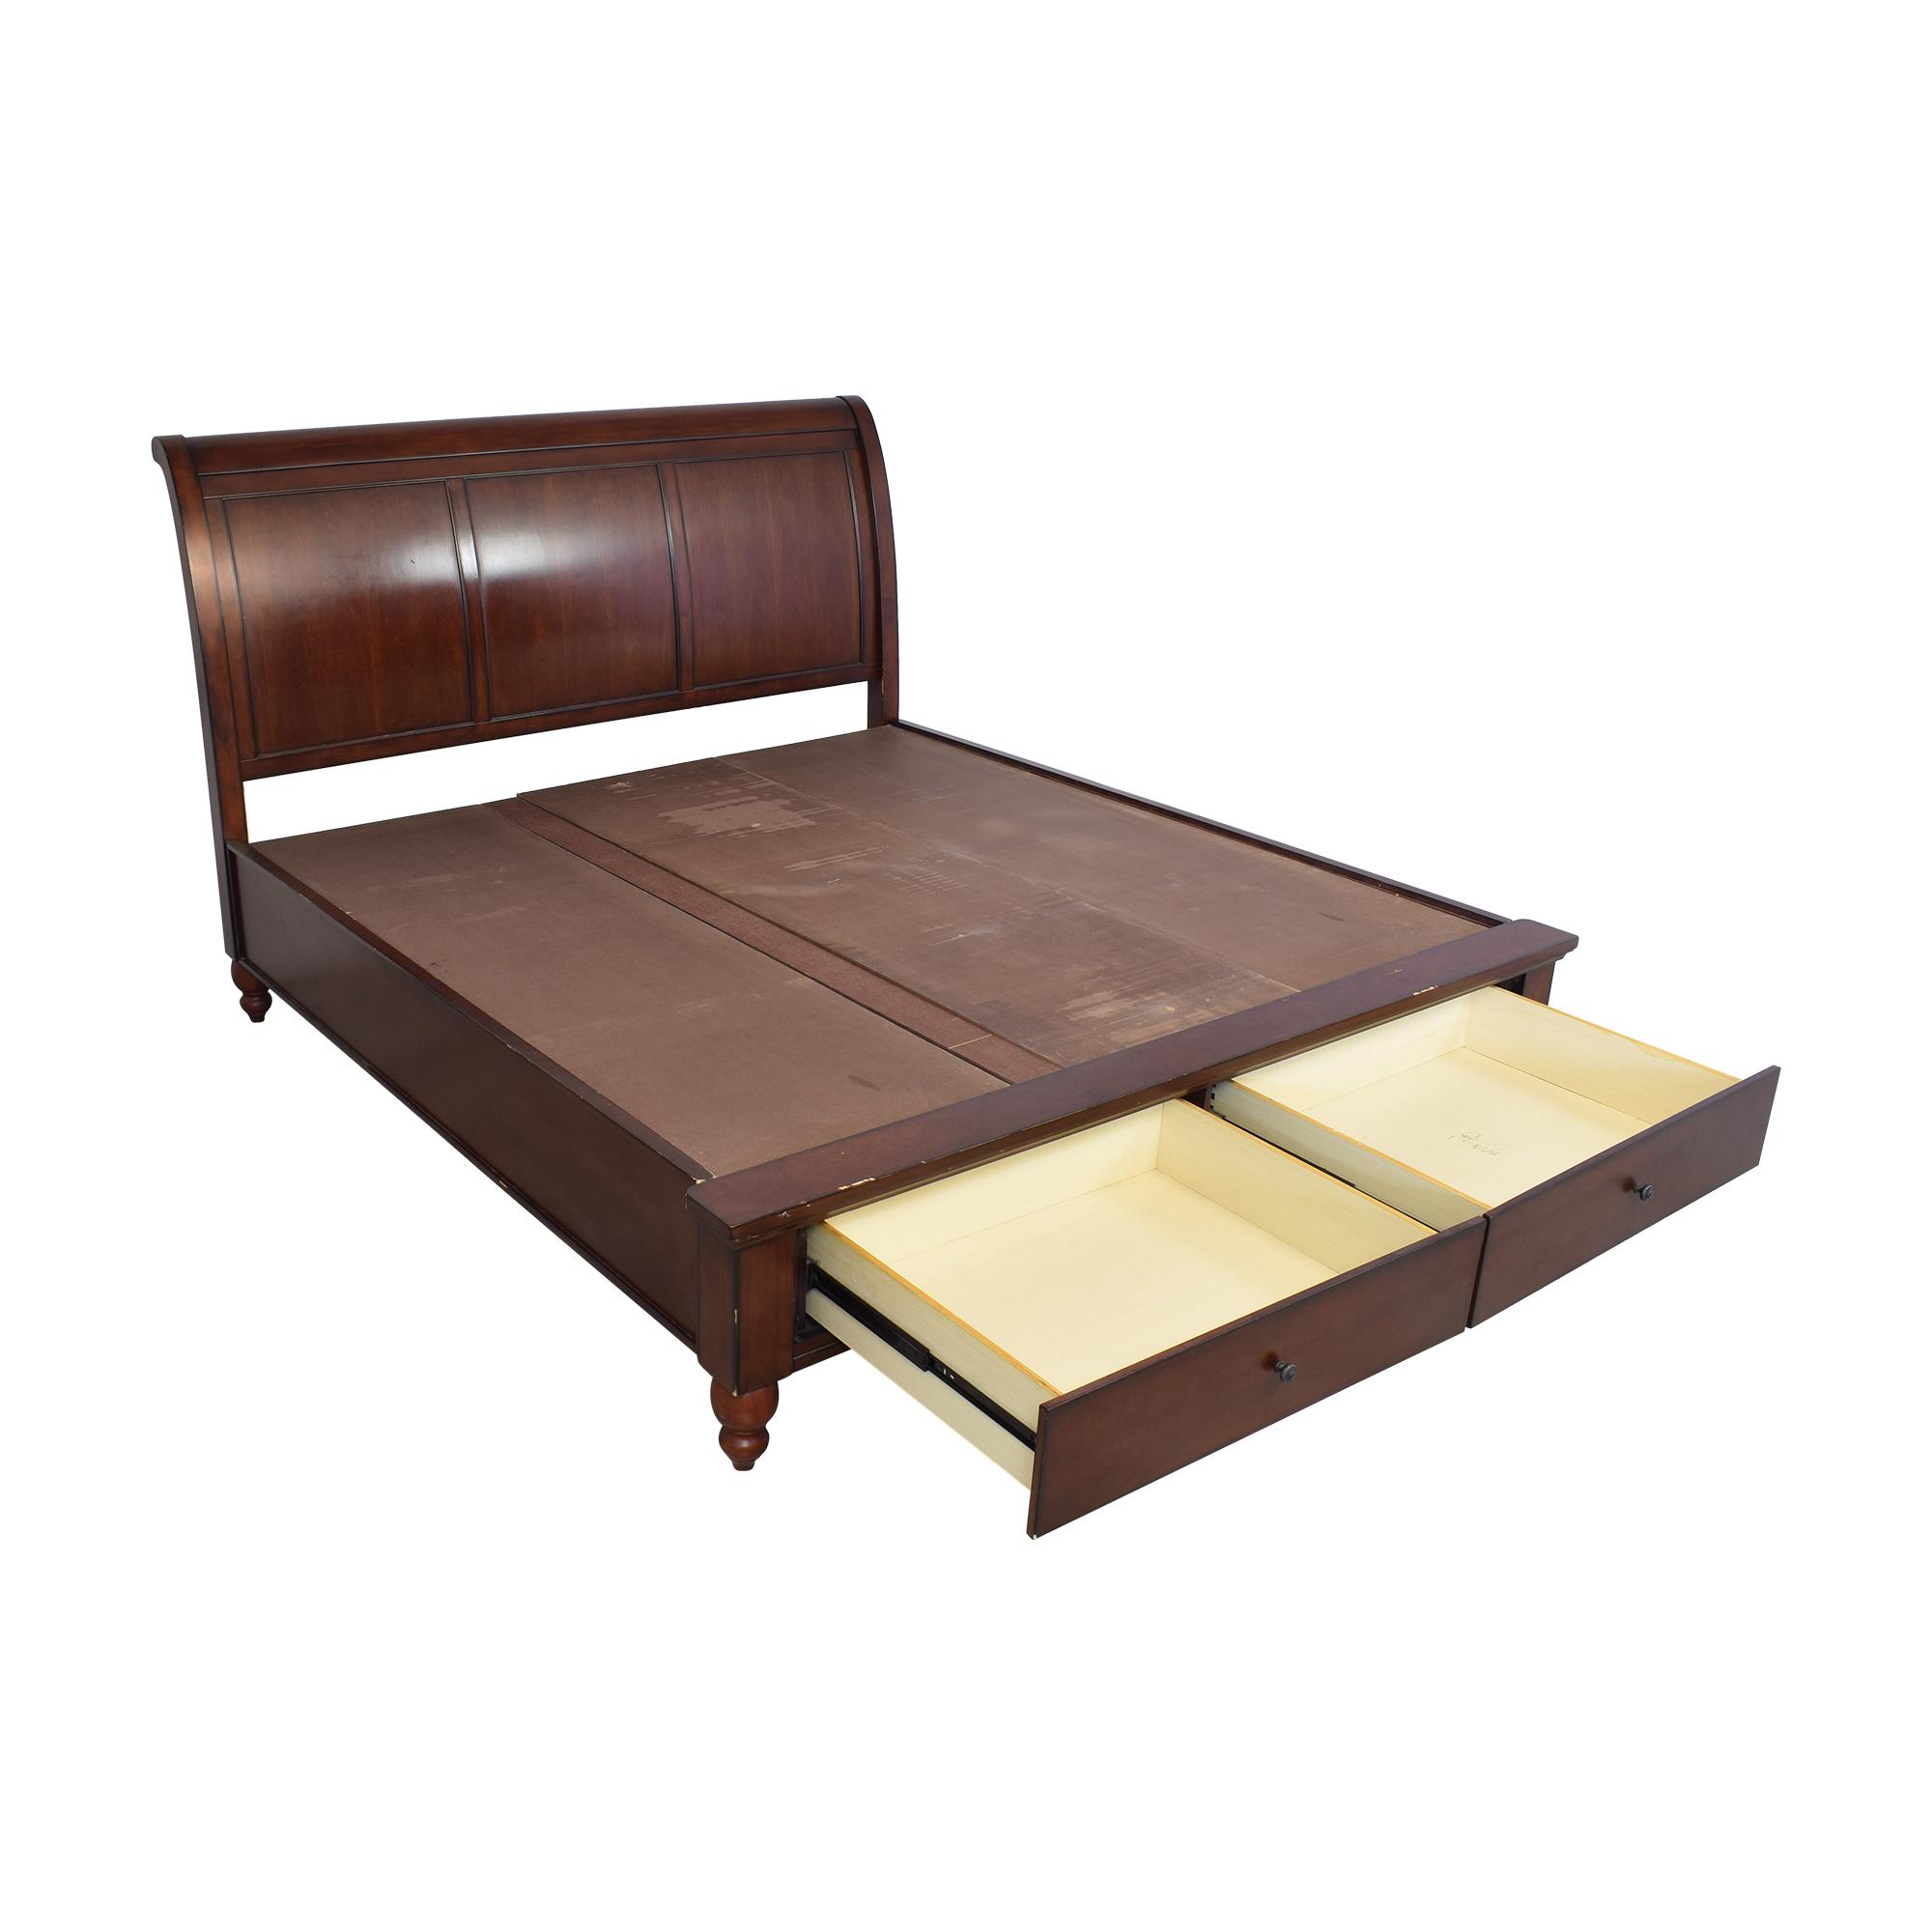 buy aspenhome aspenhome King Platform Sleigh Bed online